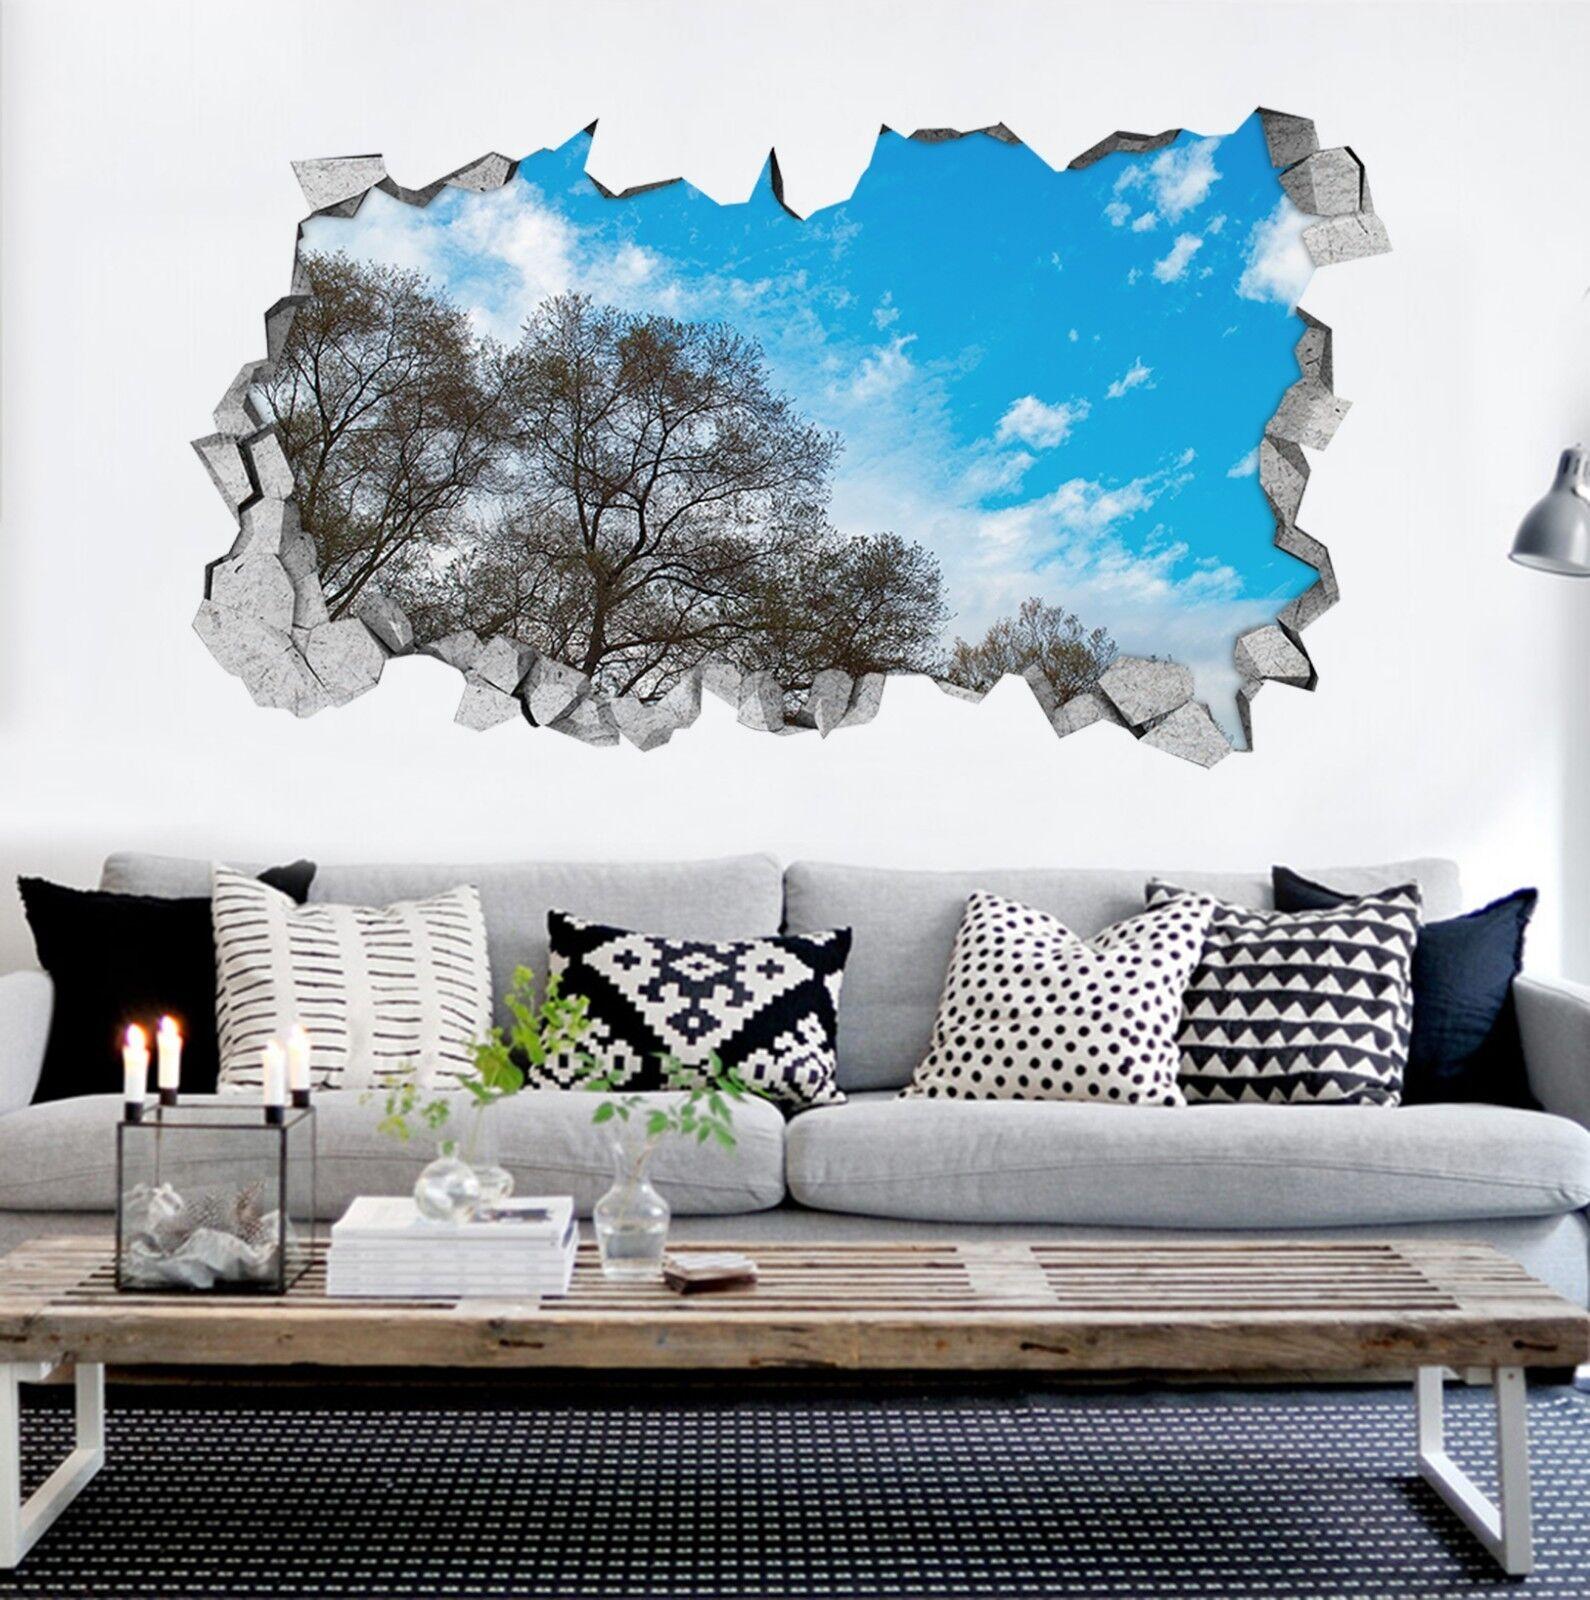 3D Alberi Cielo Blu 311 Parete Murales Adesivi Decal Sfondamento AJ WALLPAPER IT